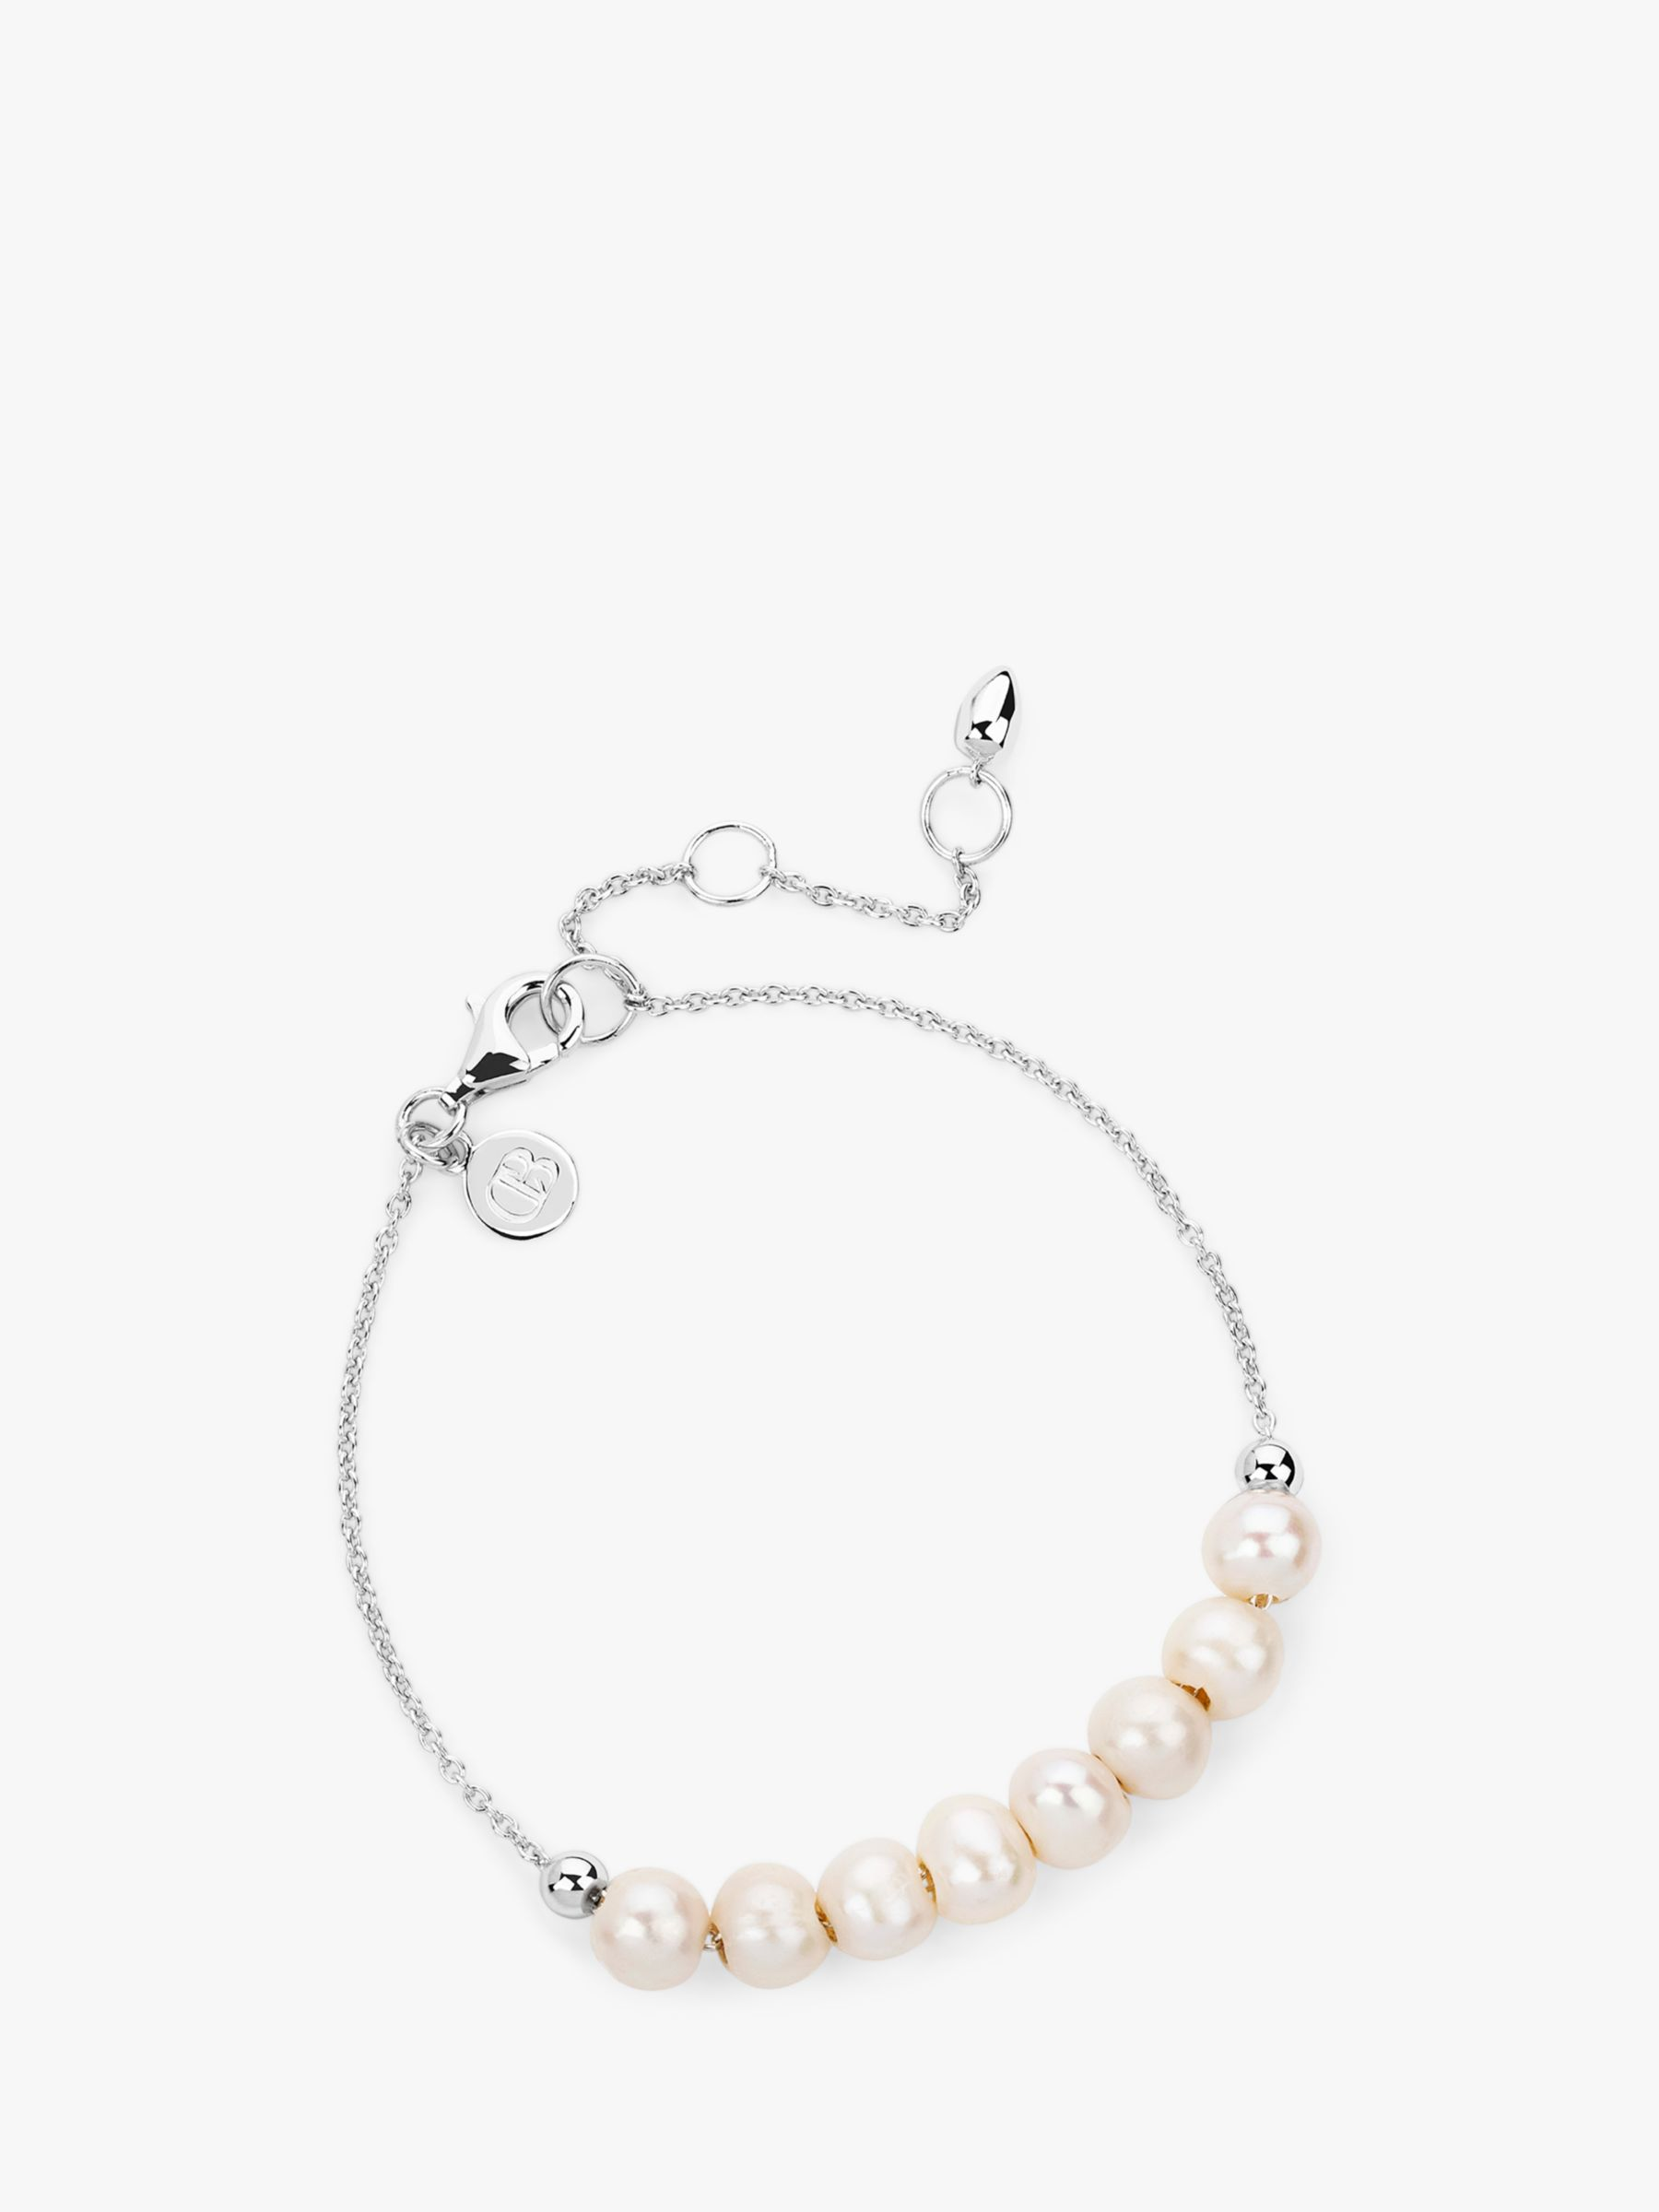 Claudia Bradby Claudia Bradby Freshwater Pearl Chain Bracelet, Silver/White